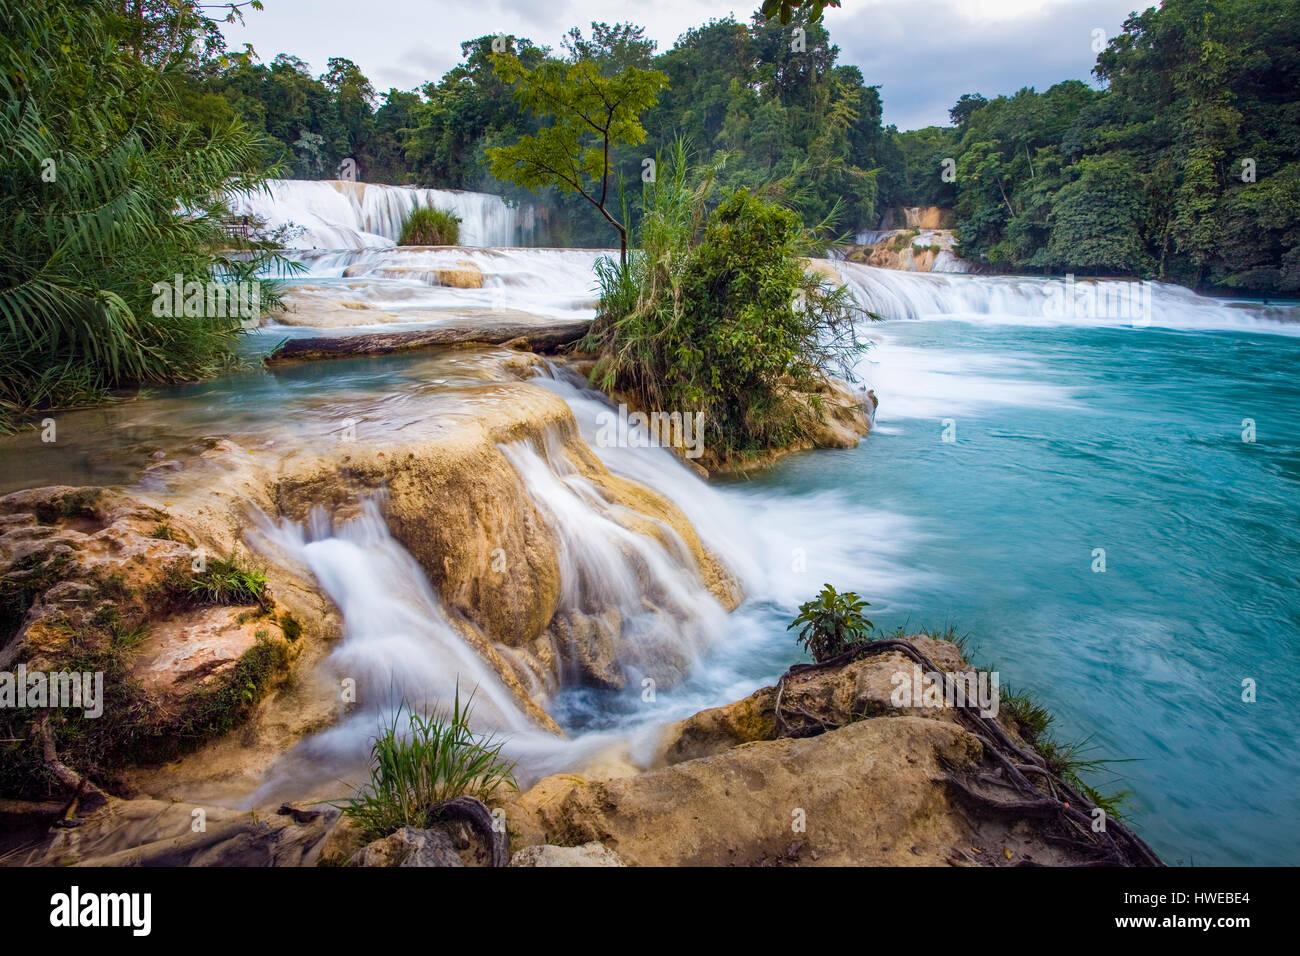 Agua Azul waterfalls in Chiapas, Mexico. - Stock Image